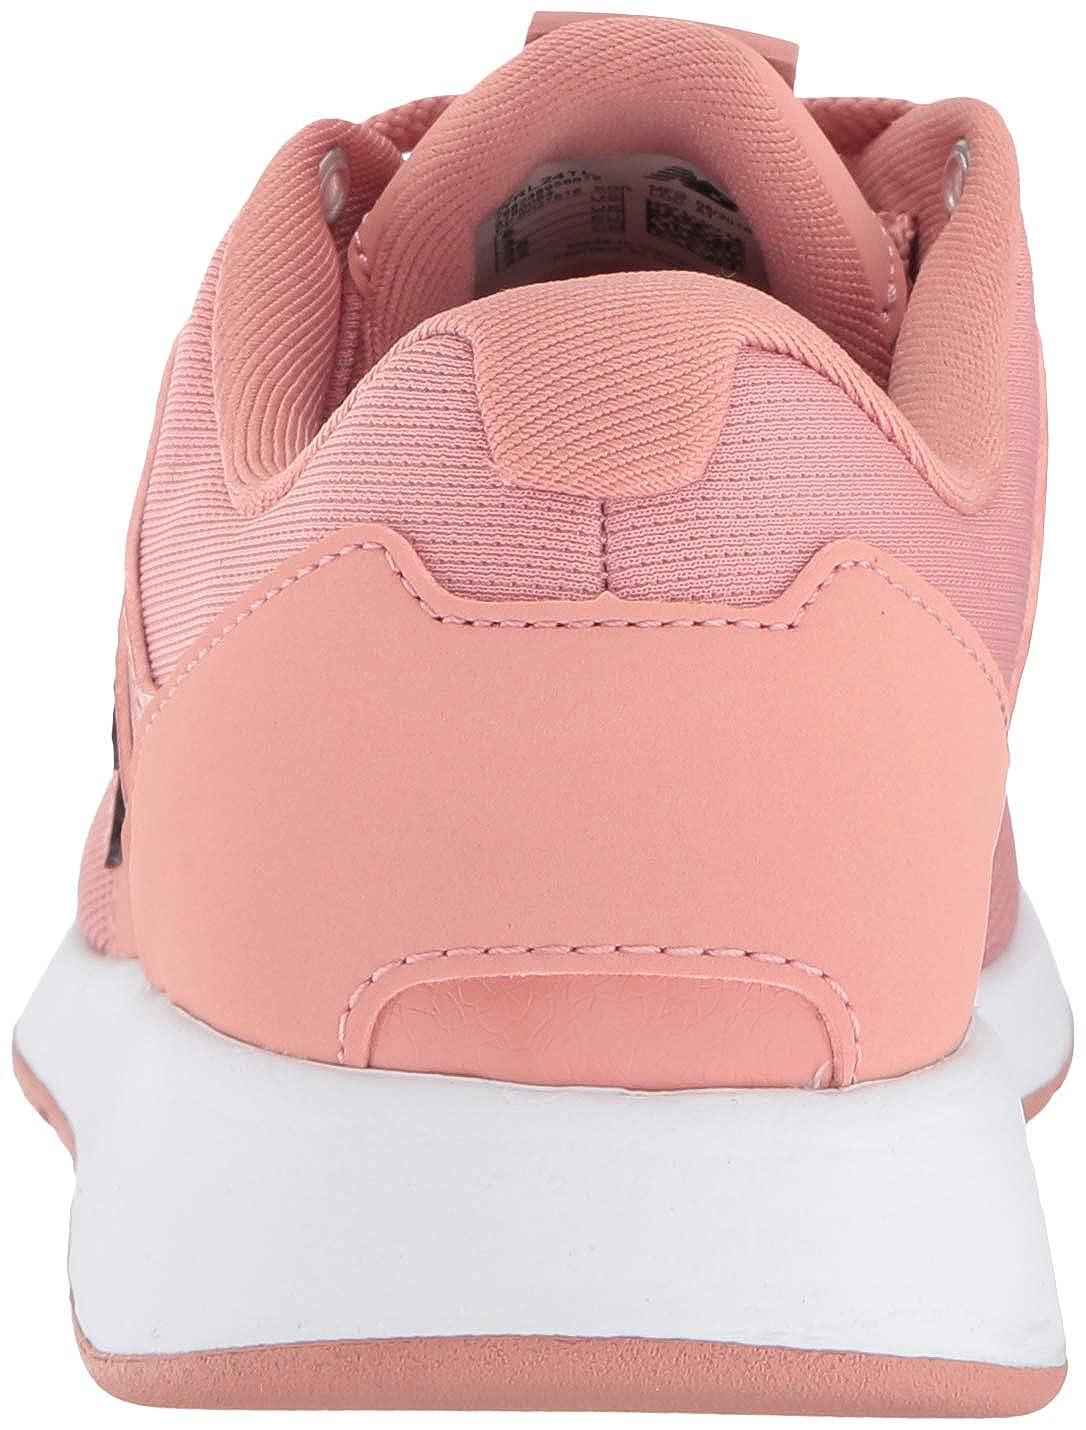 sale retailer c07a4 174d5 Amazon.com | New Balance Women's 24v1 Sneaker | Road Running